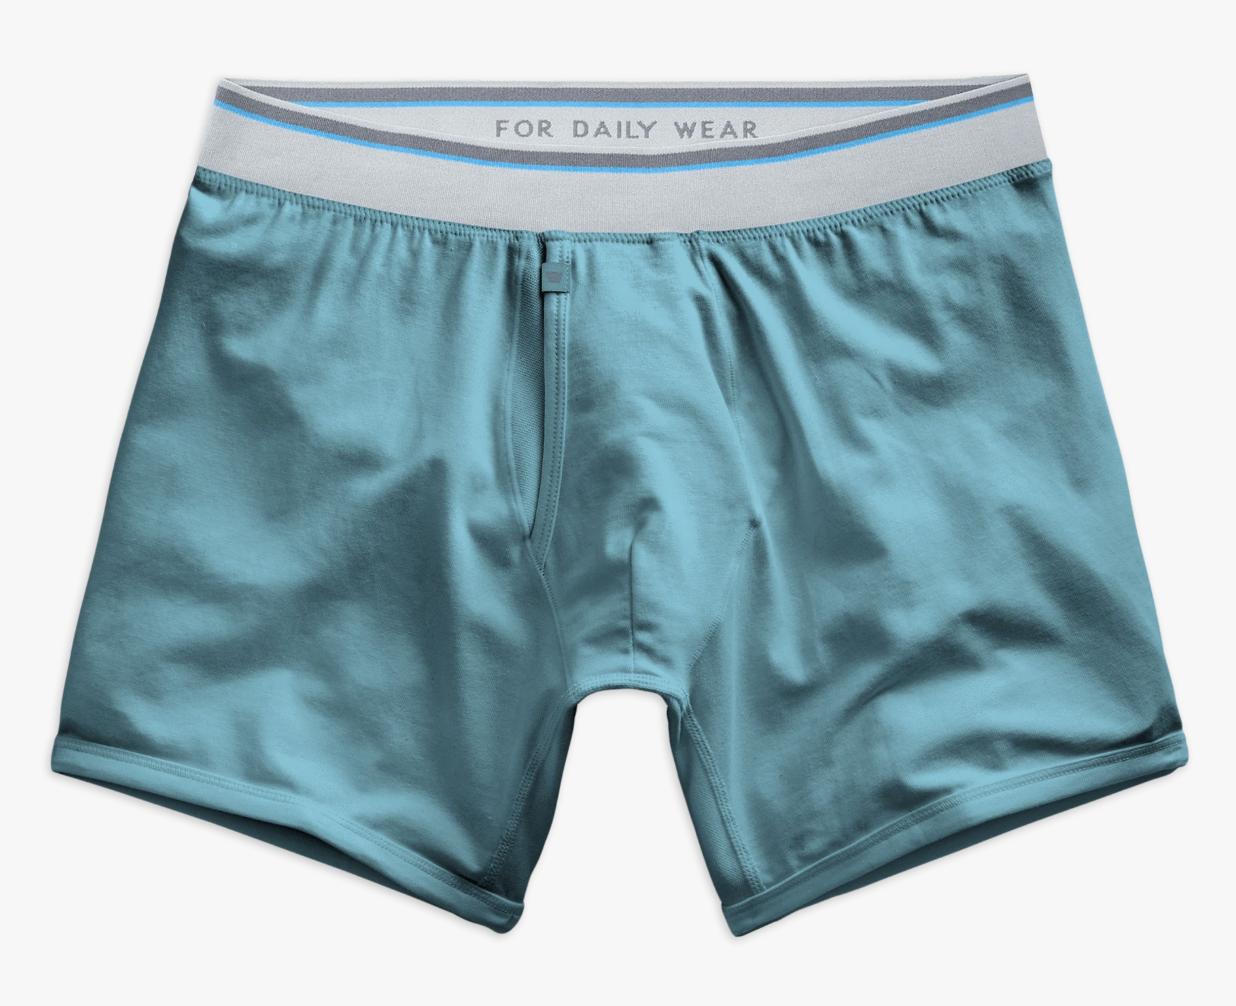 Mack Weldon 18-Hour Jersey Boxer Brief, the best men's underwear